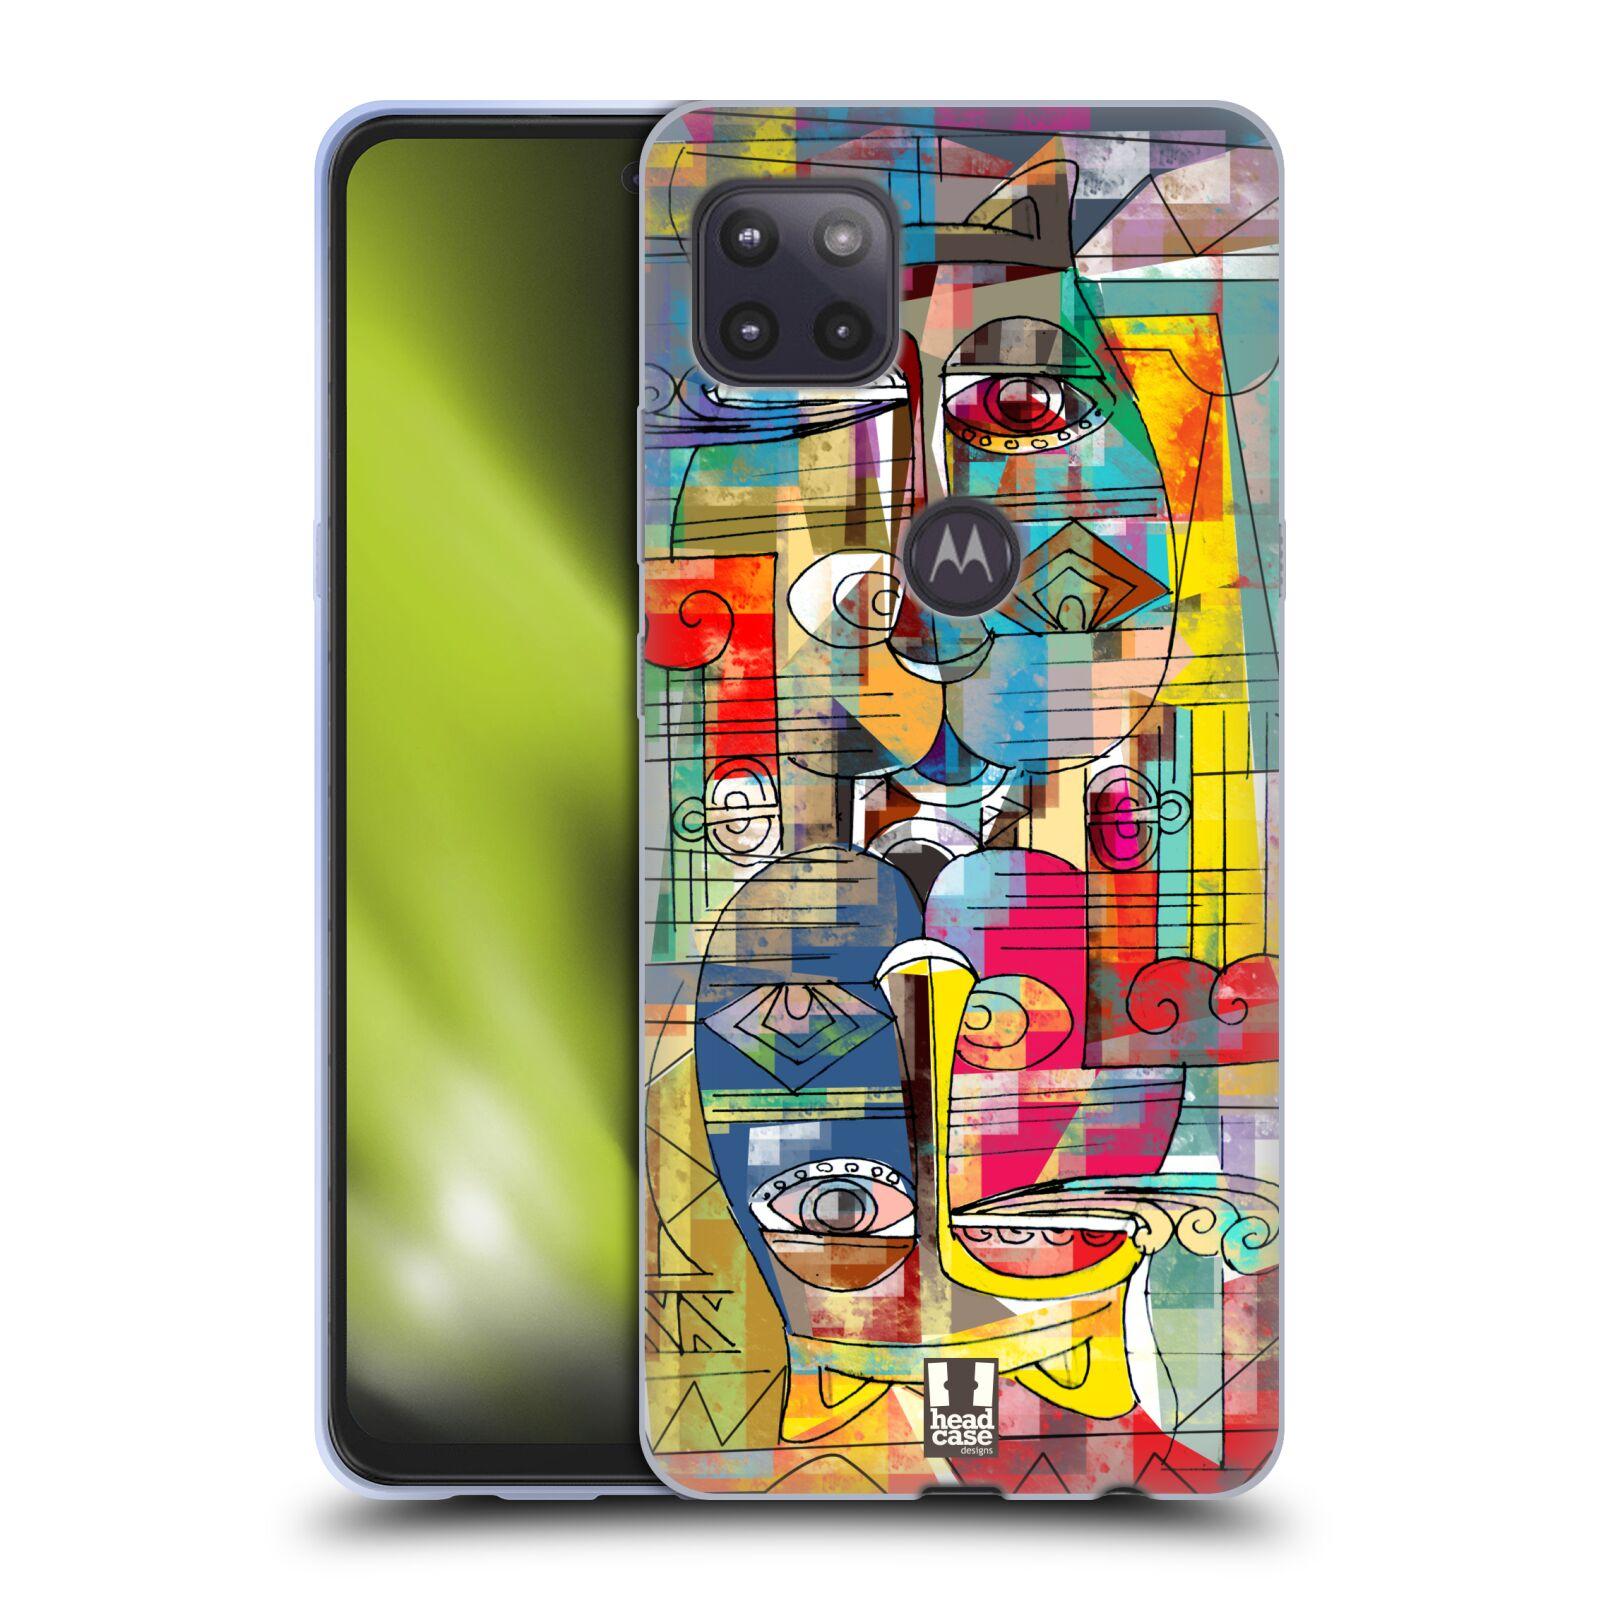 Silikonové pouzdro na mobil Motorola Moto G 5G - Head Case - AZTEC MANX